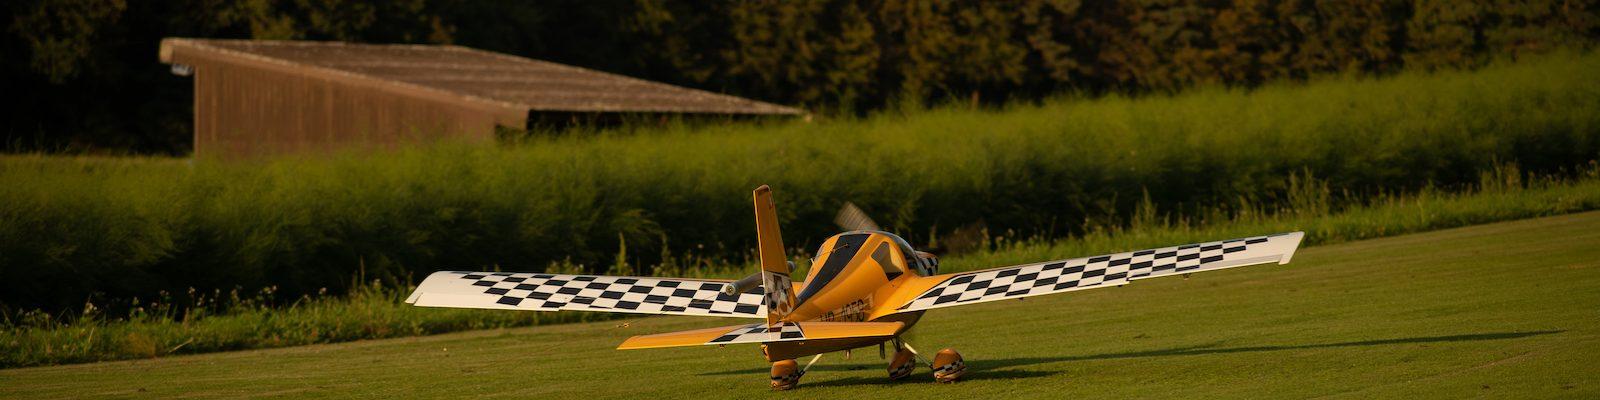 Flugplatz_header_1